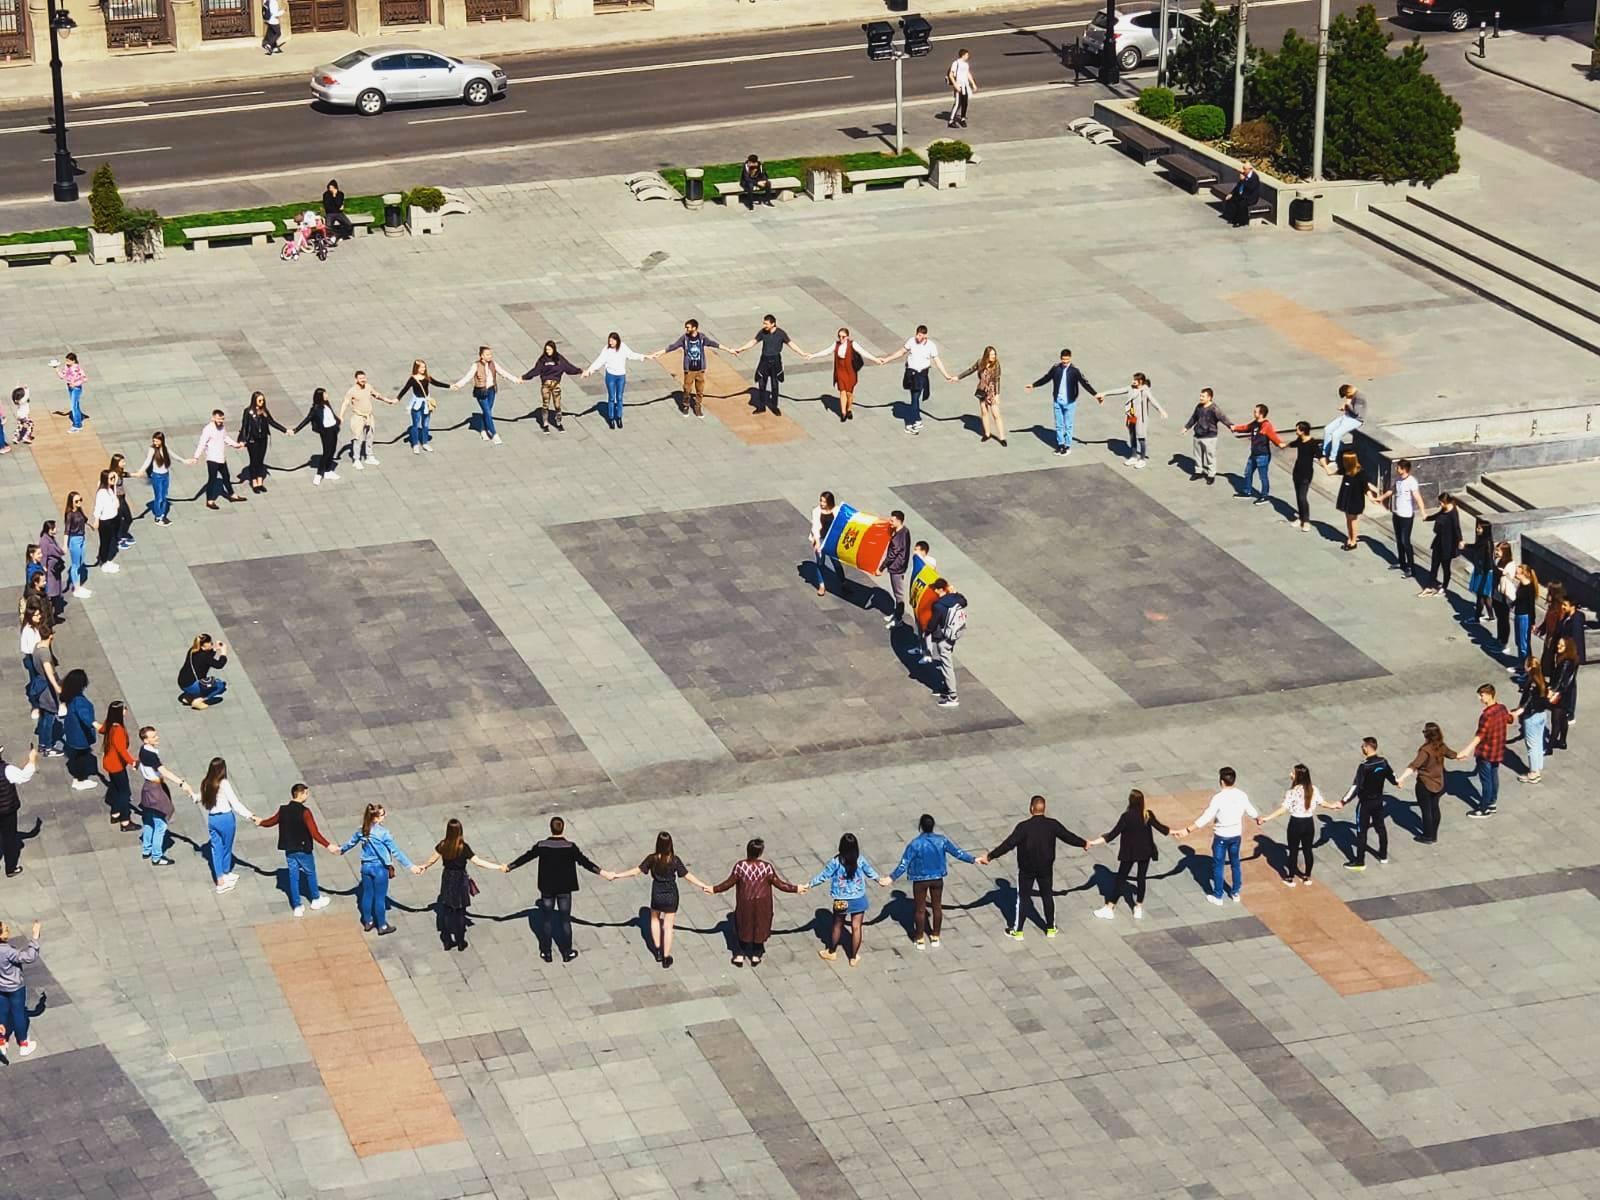 Foto: Studenți basarabeni la Universitatea din Craiova. Foto: ER News